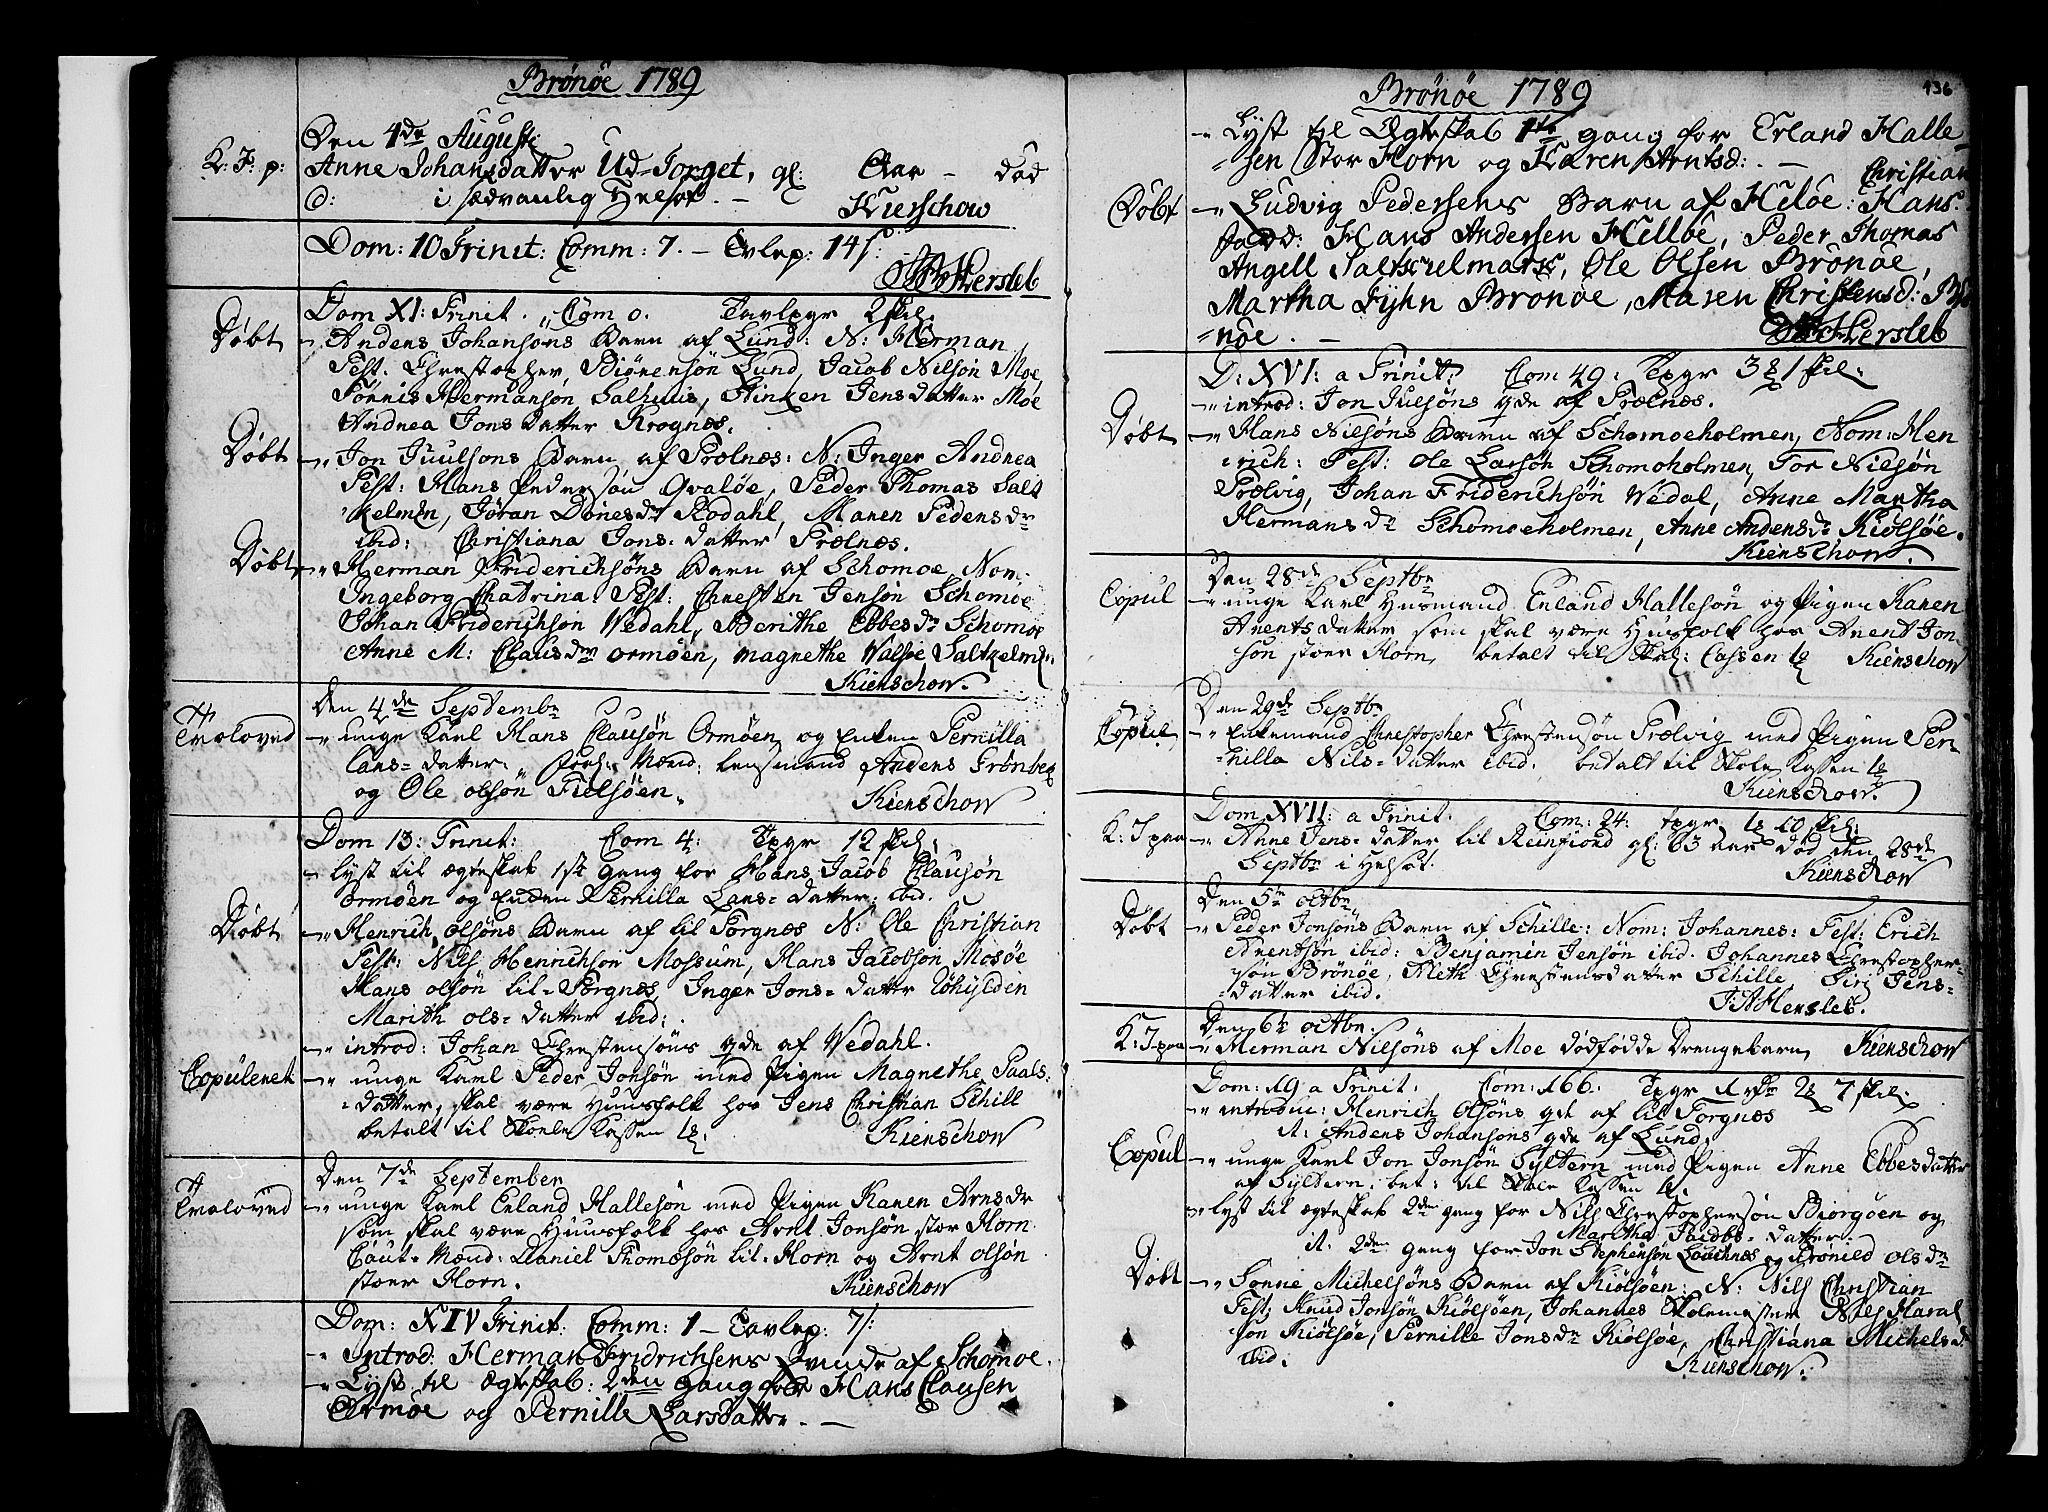 SAT, Ministerialprotokoller, klokkerbøker og fødselsregistre - Nordland, 813/L0195: Ministerialbok nr. 813A05, 1752-1803, s. 136